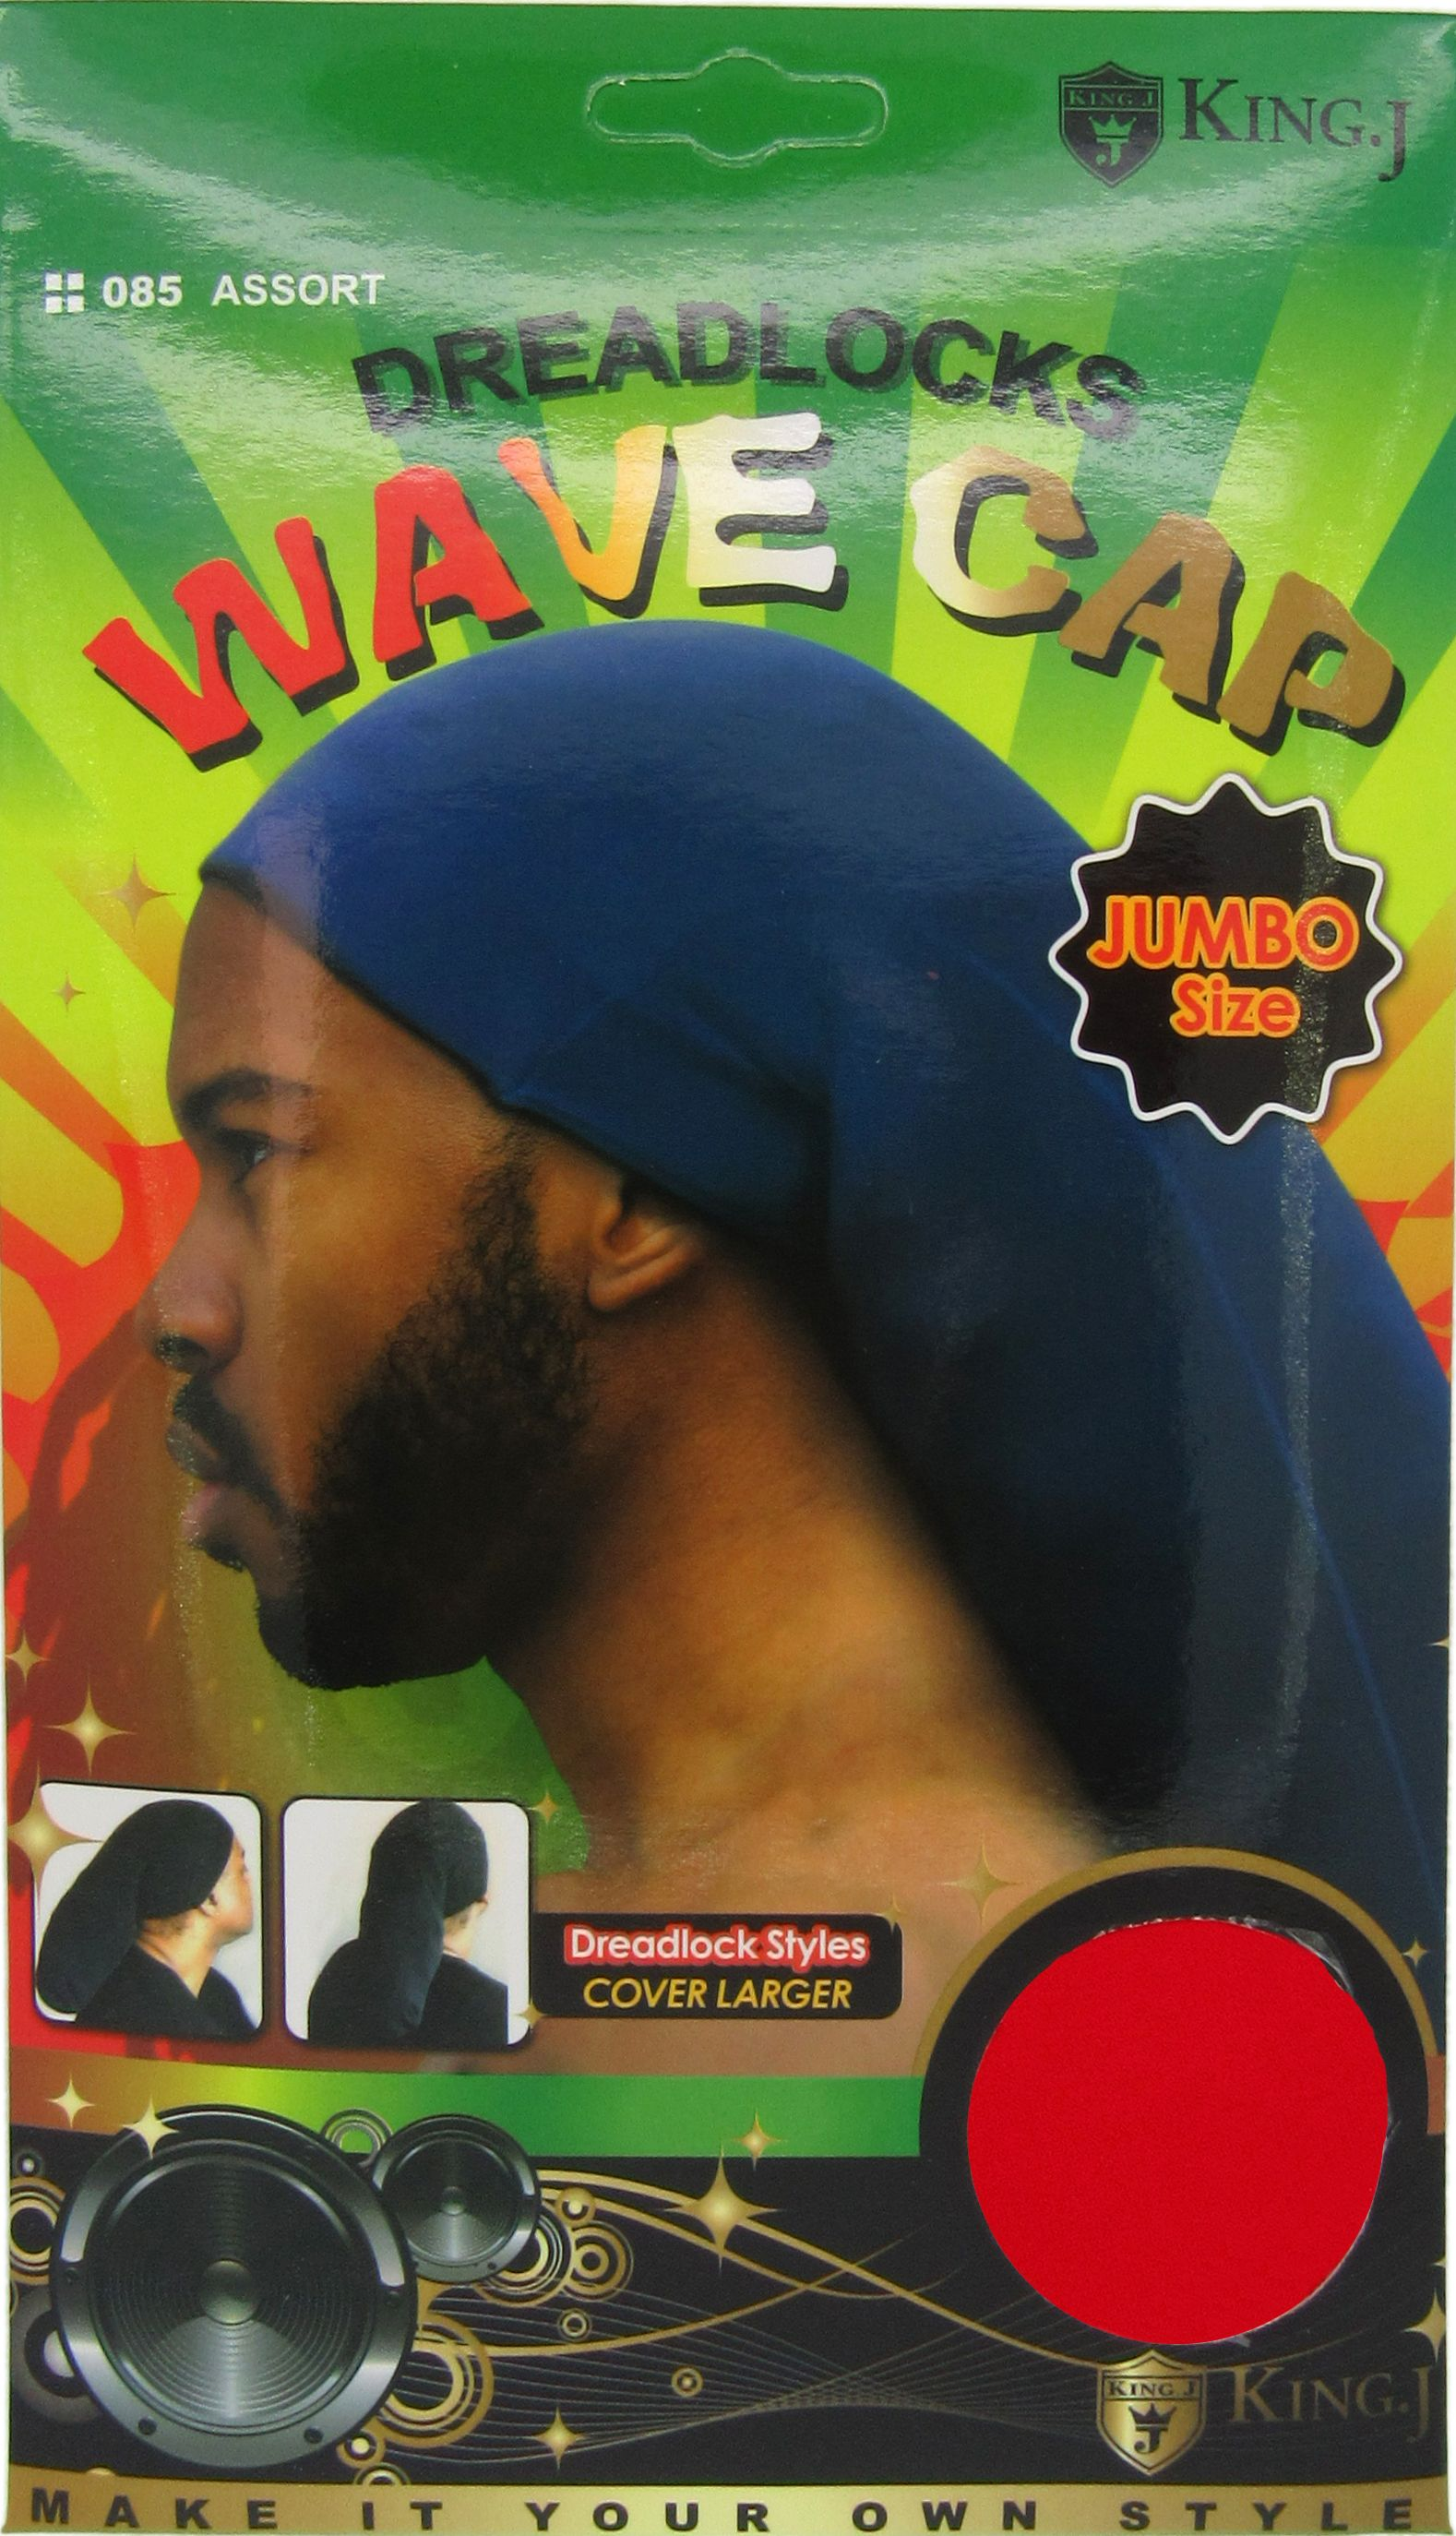 Dreadlocks jumbo rasta stocking wave hat cap reggae marley